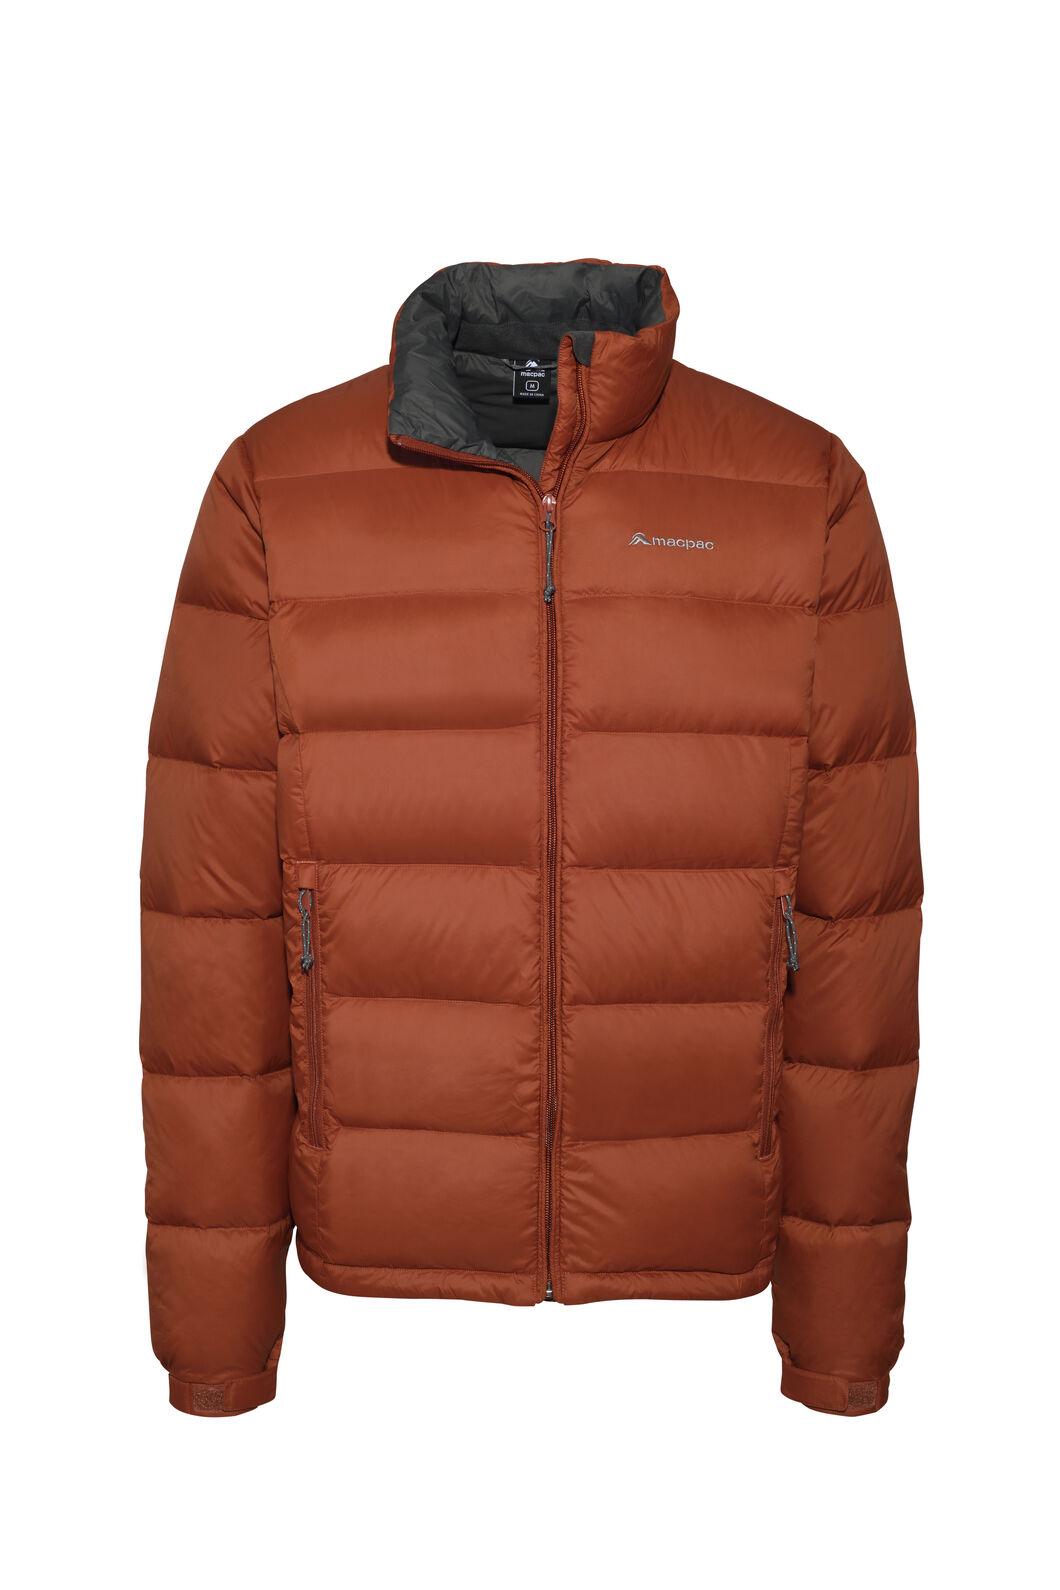 Macpac Halo Down Jacket — Men's, Burnt Henna, hi-res